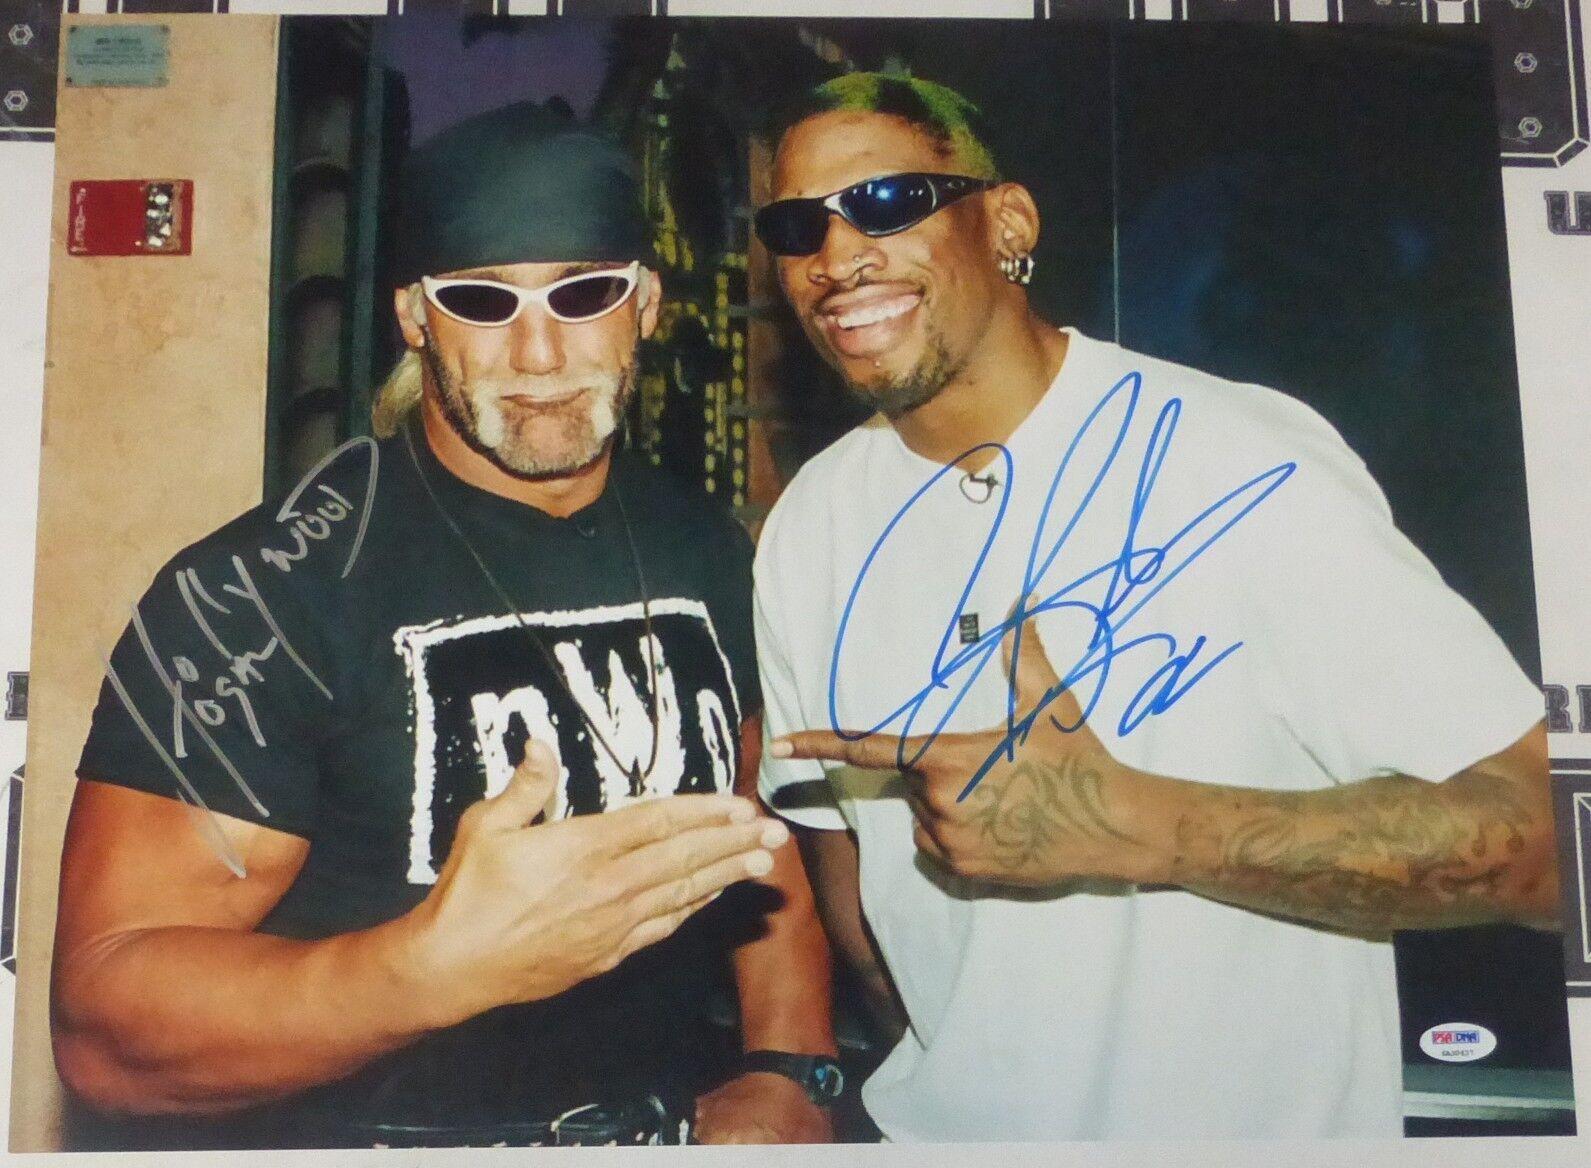 Dennis Rodhomme Hulk Hogan Signé Wwe 16x20 Photo PSA   DNA COA Image Auto Wcw Nwo